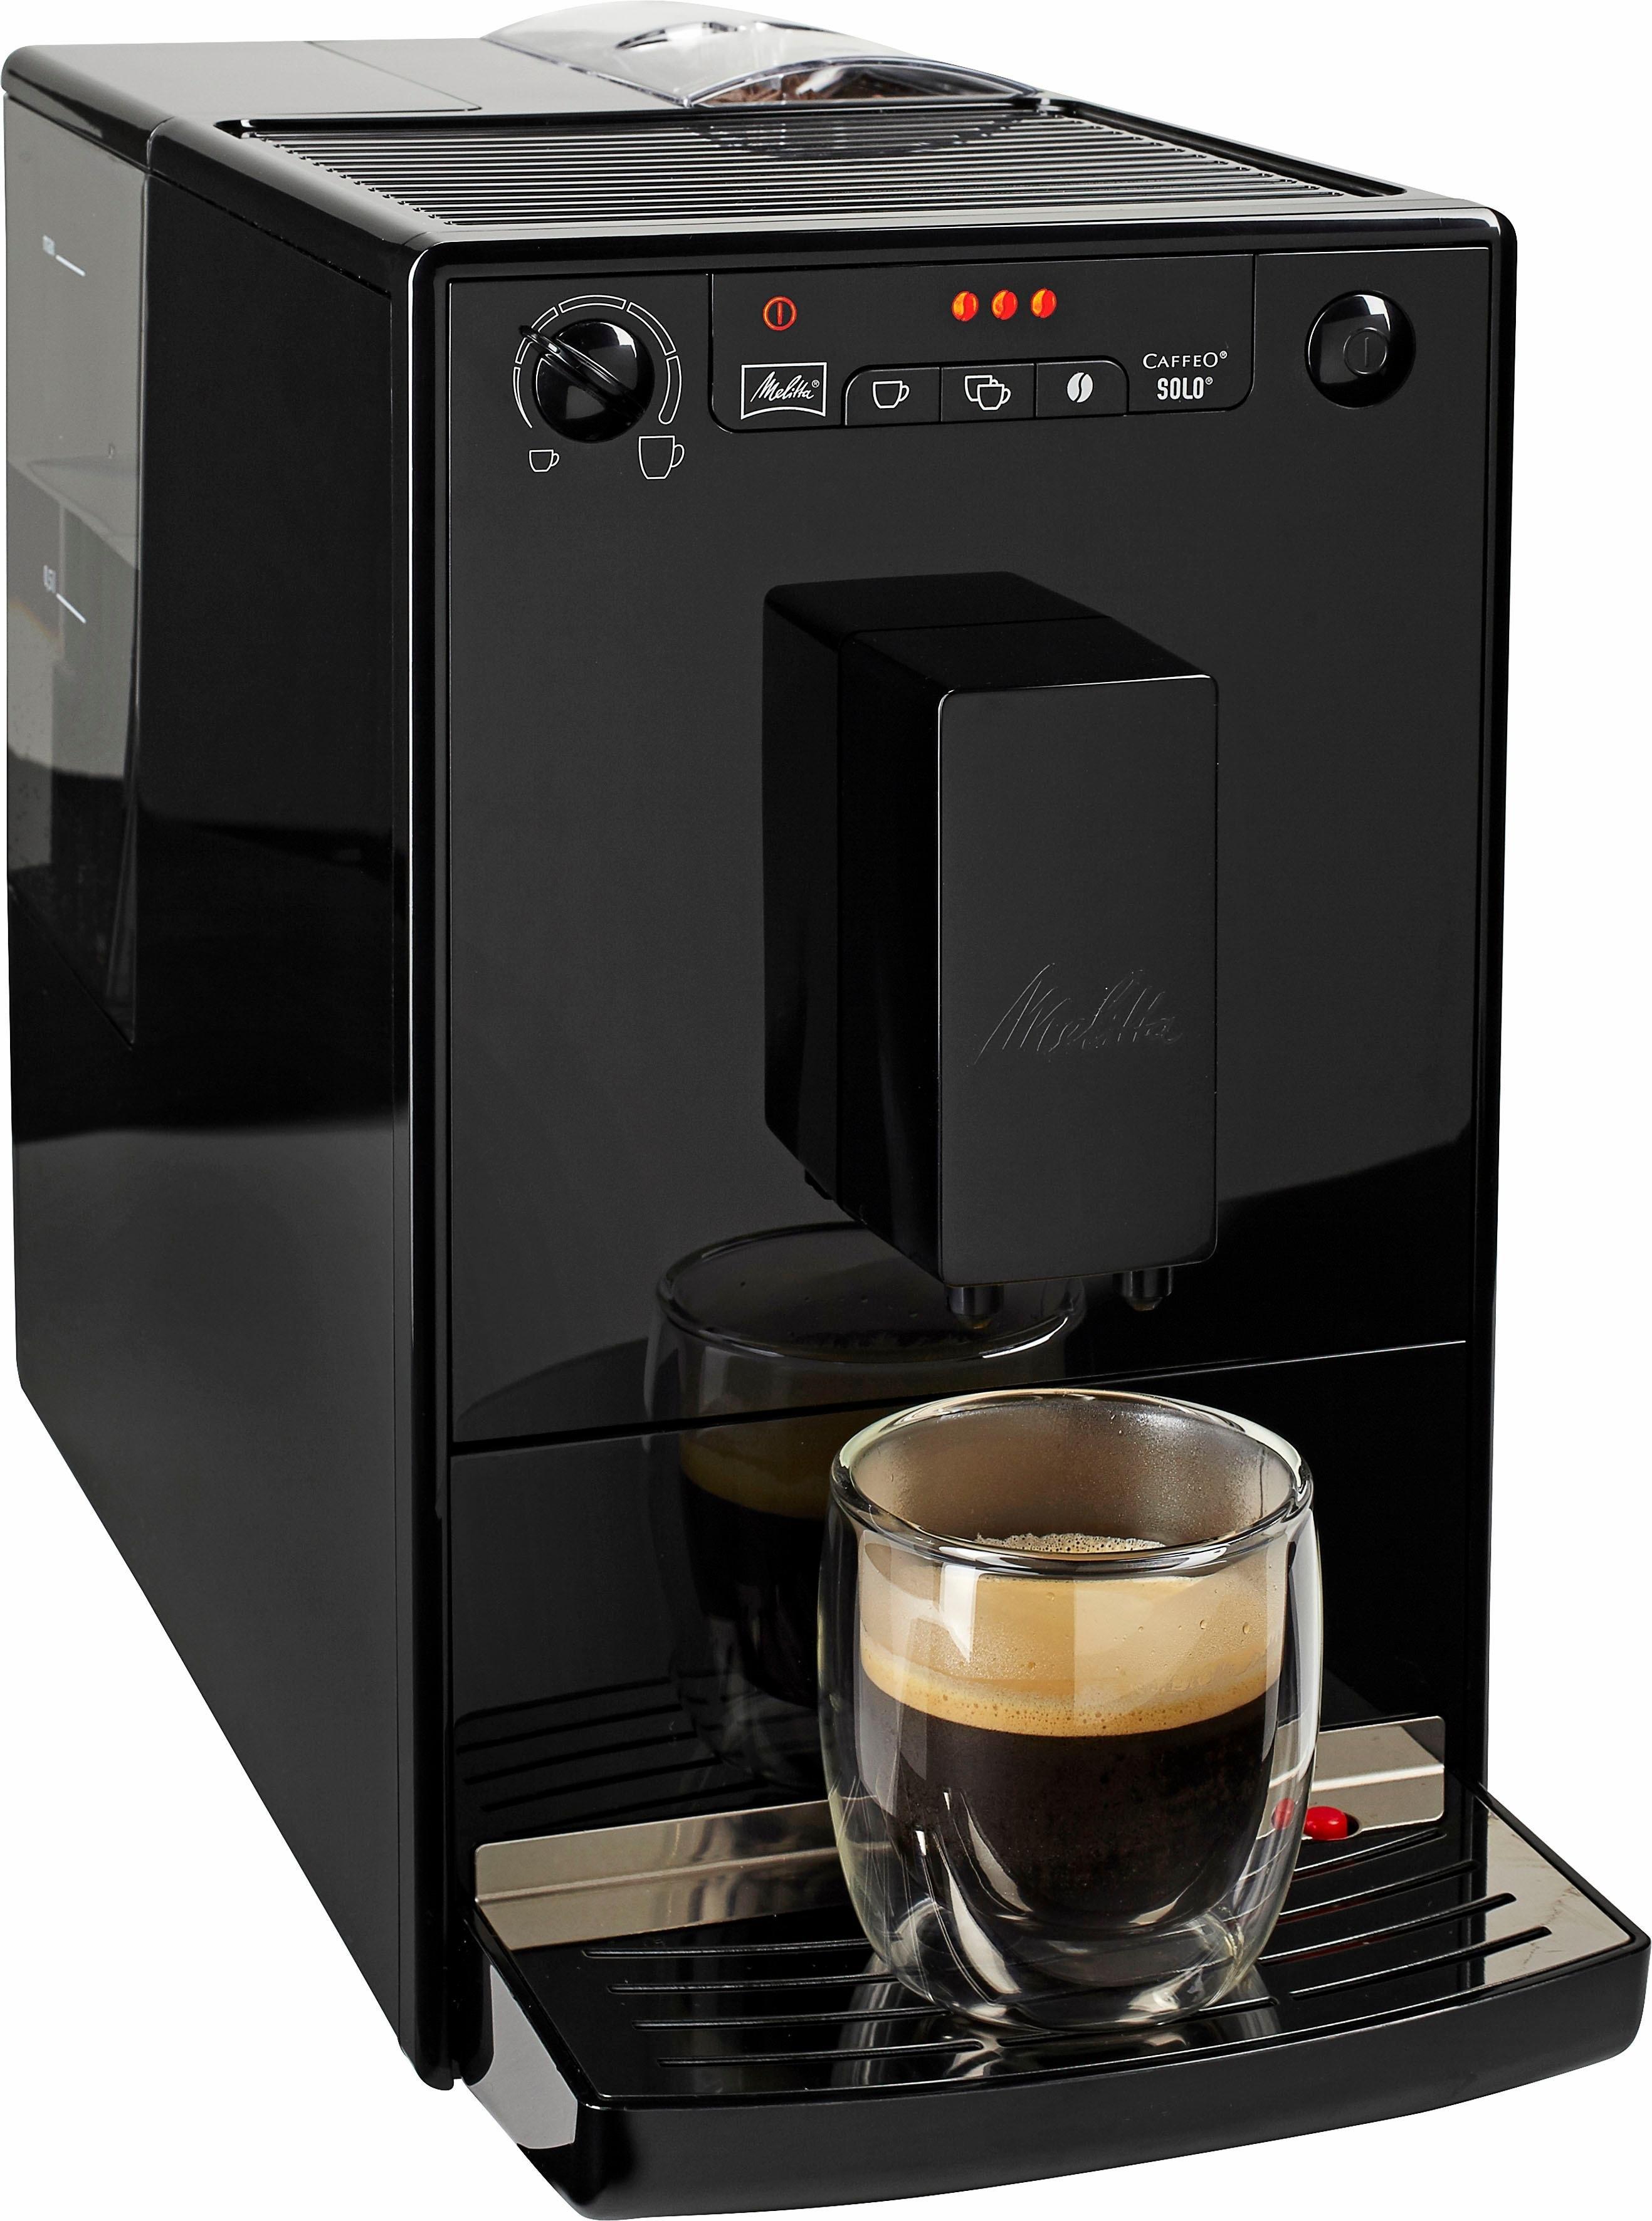 Melitta volautomatisch koffiezetapparaat Caffeo Solo Pure Black E 950-222, zwart - gratis ruilen op otto.nl